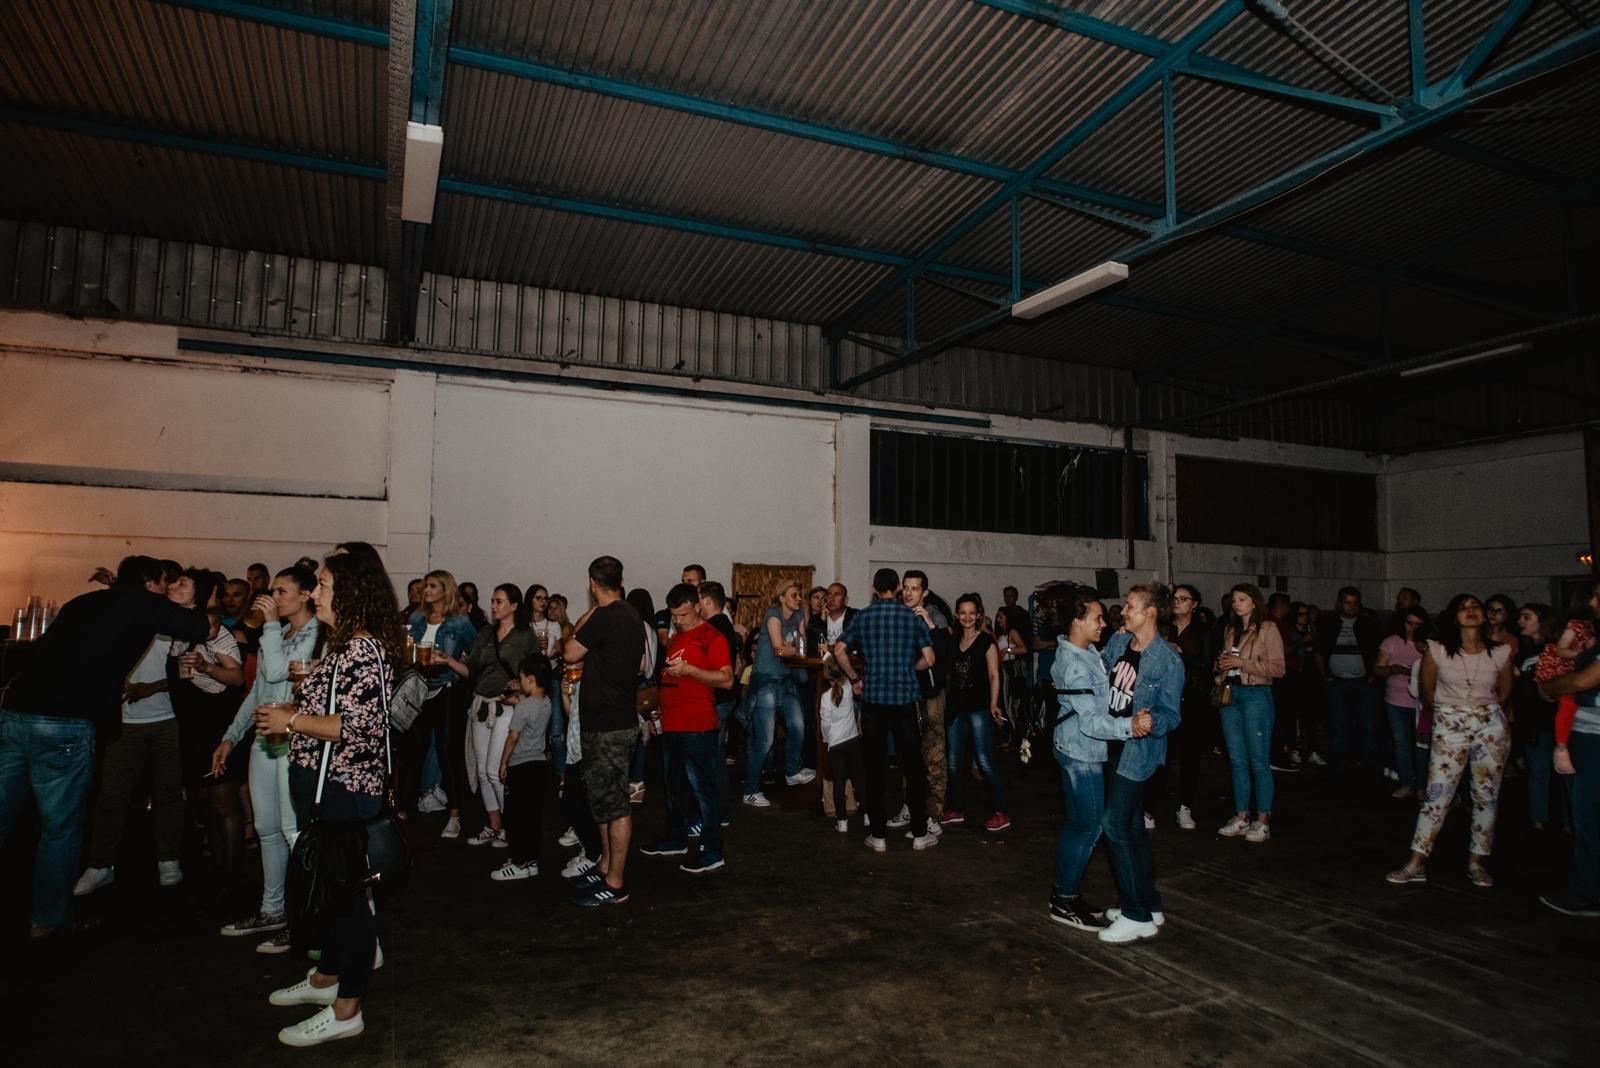 likaclub_korenica_neno-belan_2019-33